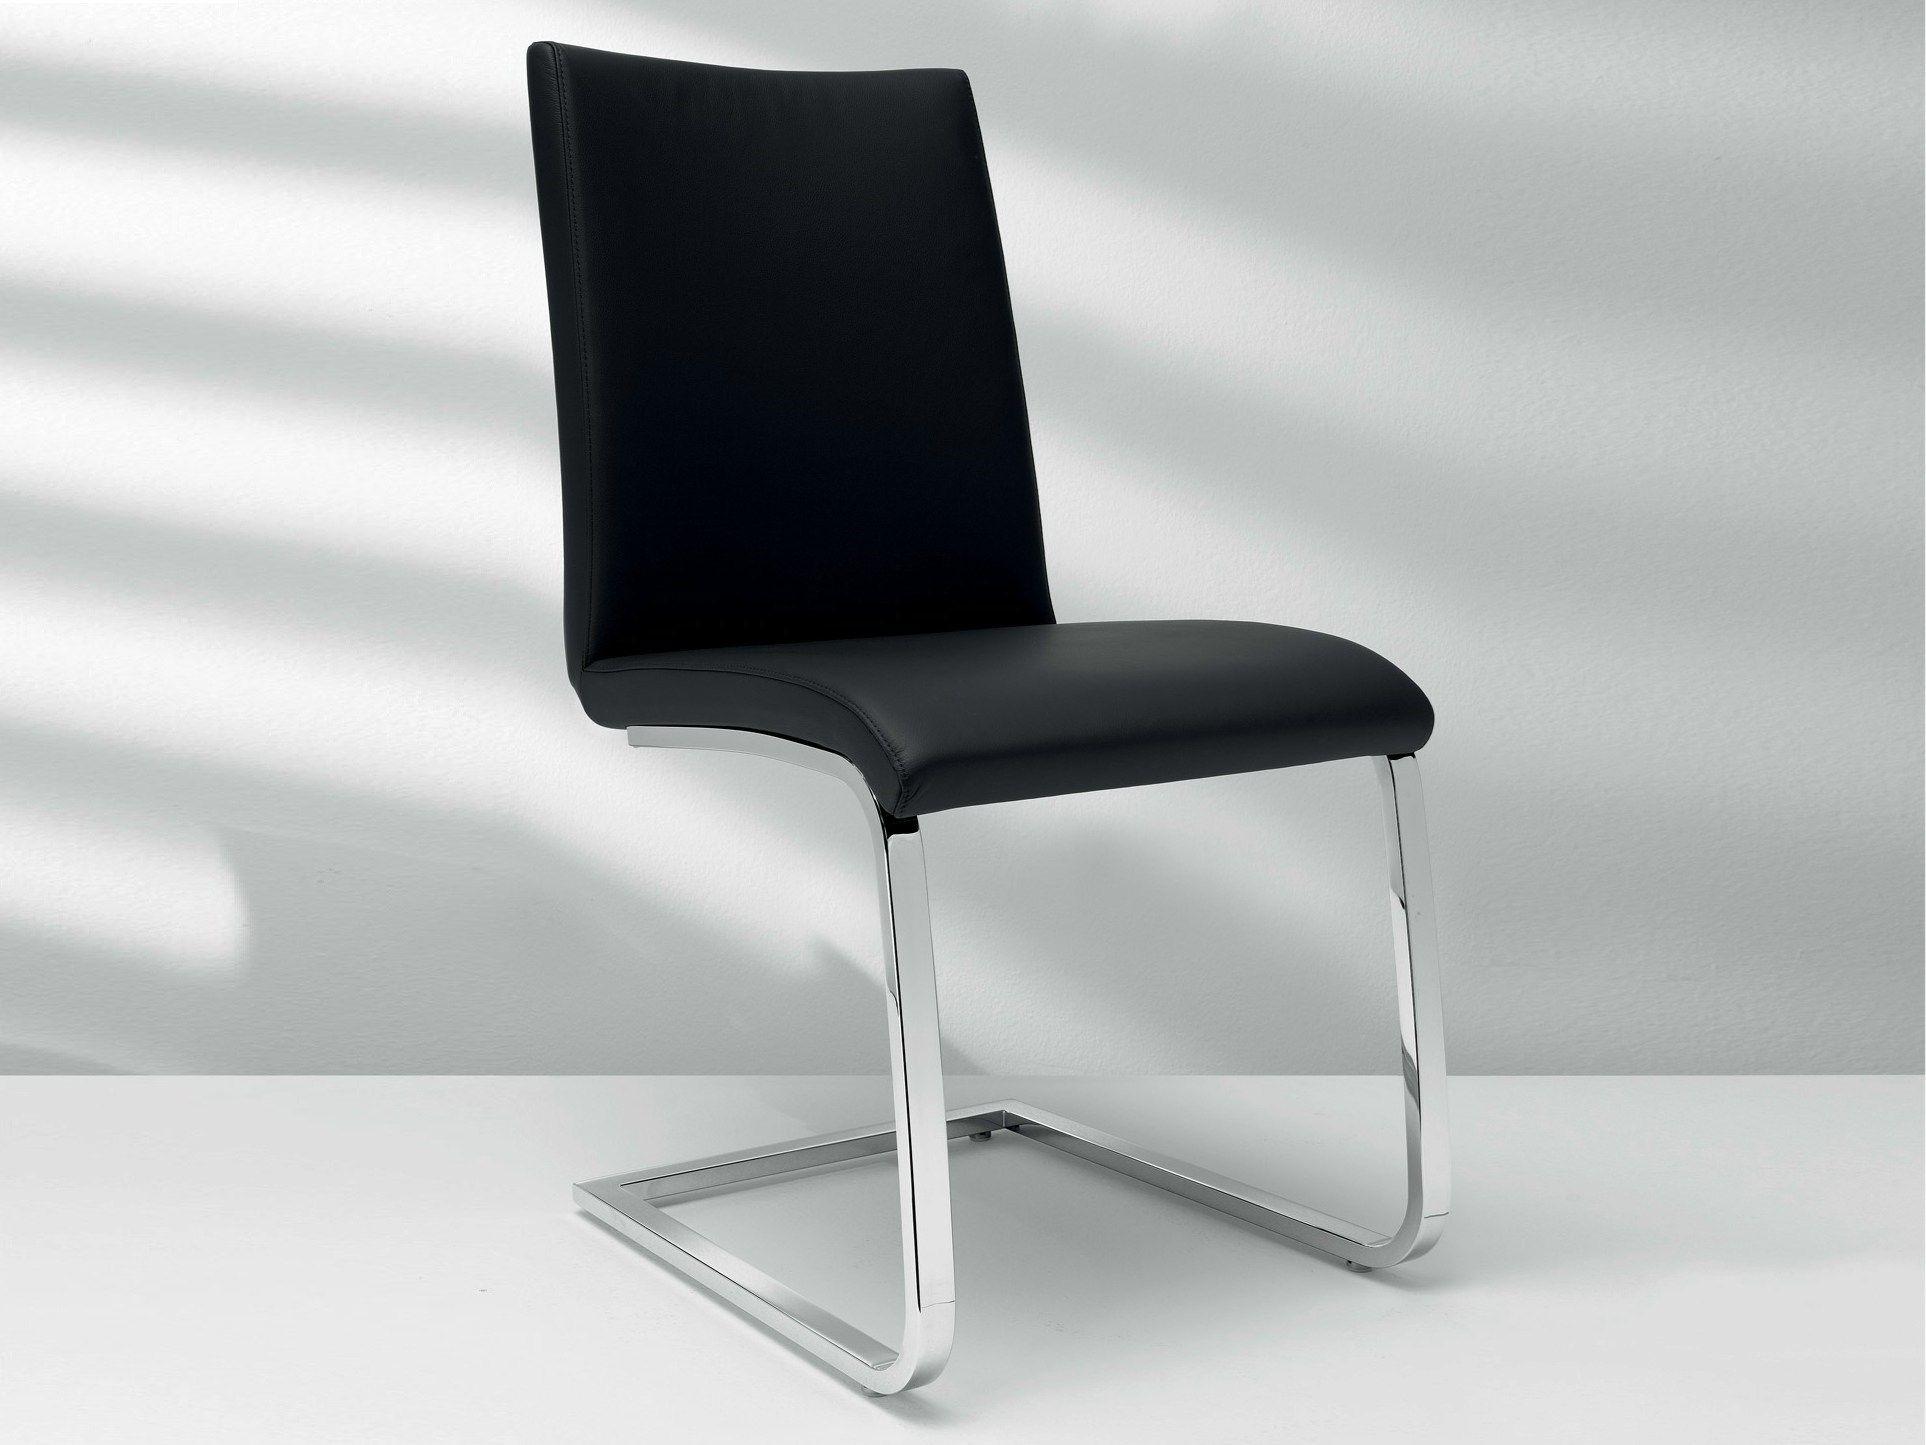 d24 freischwinger by h lsta werke h ls. Black Bedroom Furniture Sets. Home Design Ideas